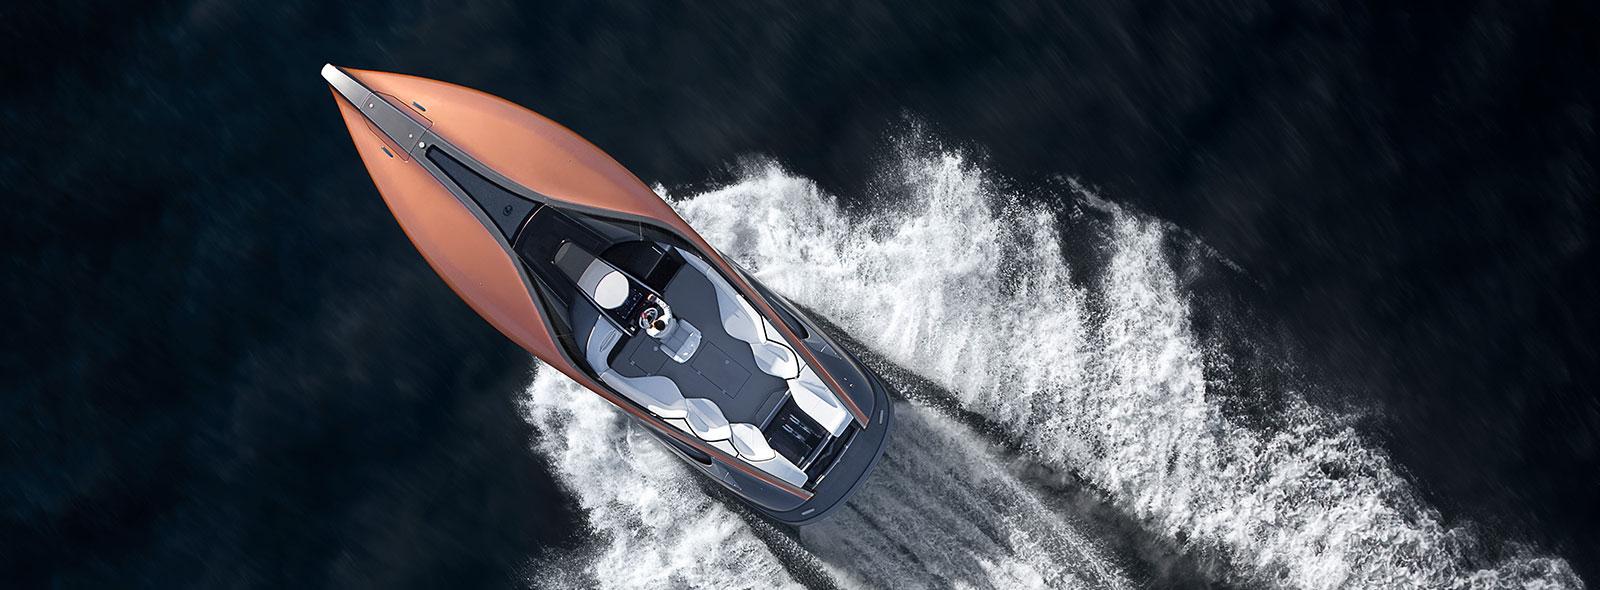 Lexus Sport Yacht ovanifrån